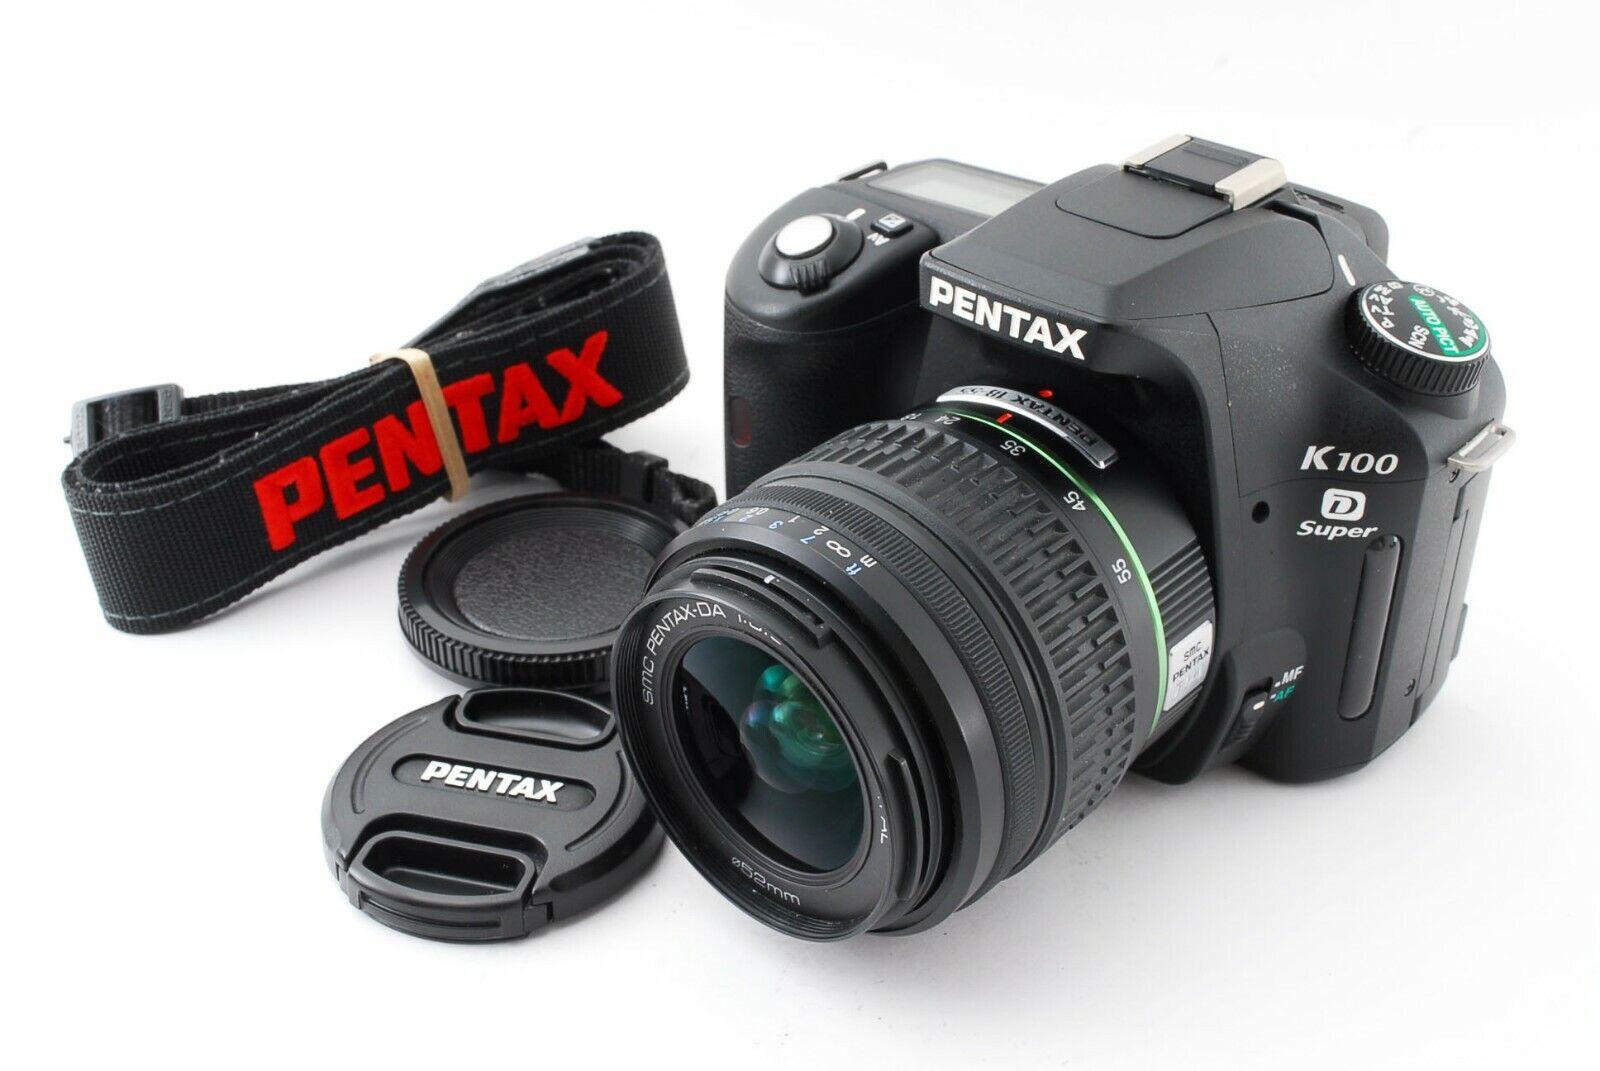 Pentax K100D Super 6.1mp Digital SLR Camera (1500shots) w/ 18-55mm [Exc+++] #1A camera digital k100d pentax slr super